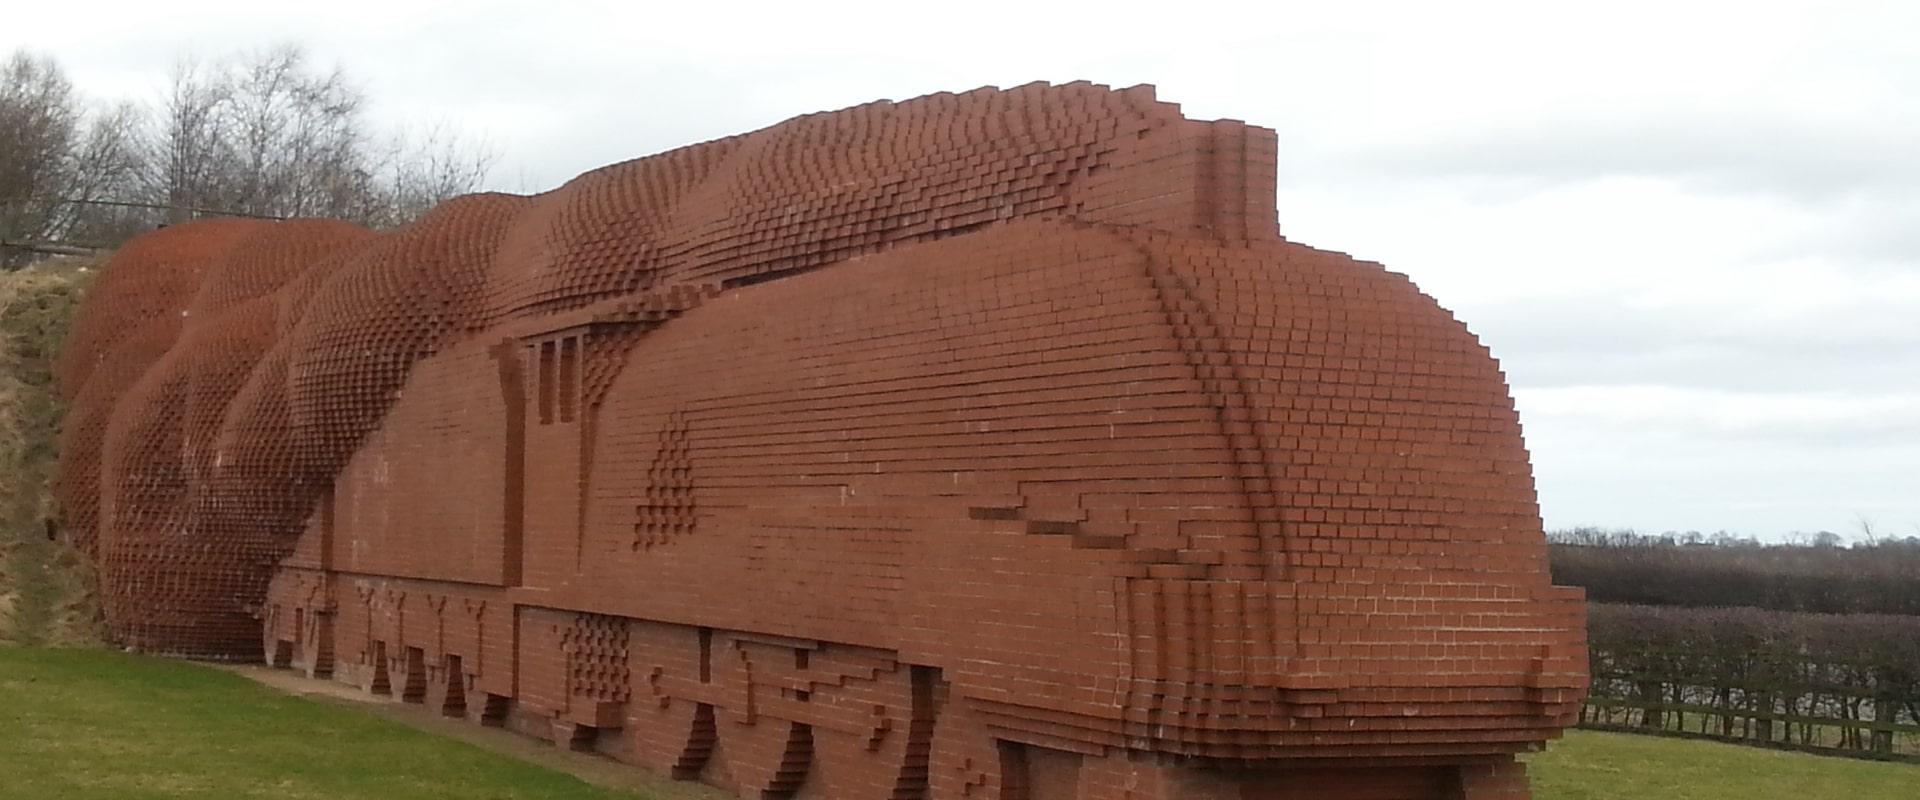 Darlington Train brick statue